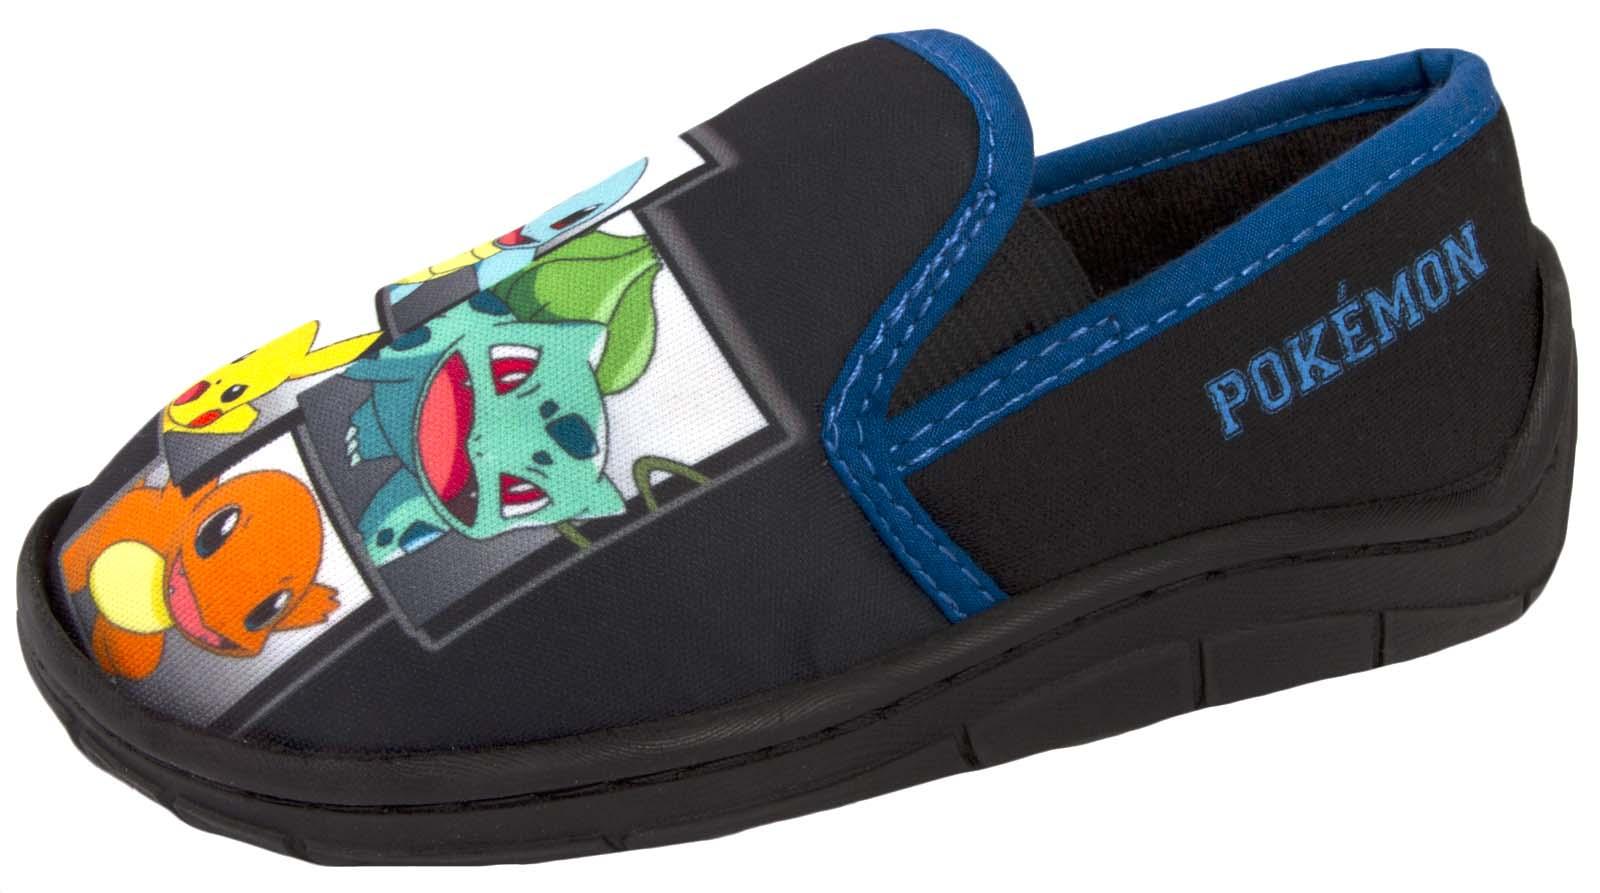 on sale 575d6 0f70f Boys-Pokemon-GO-Slippers-Pikachu-Bulbasaur-Charmander-Squirtle-